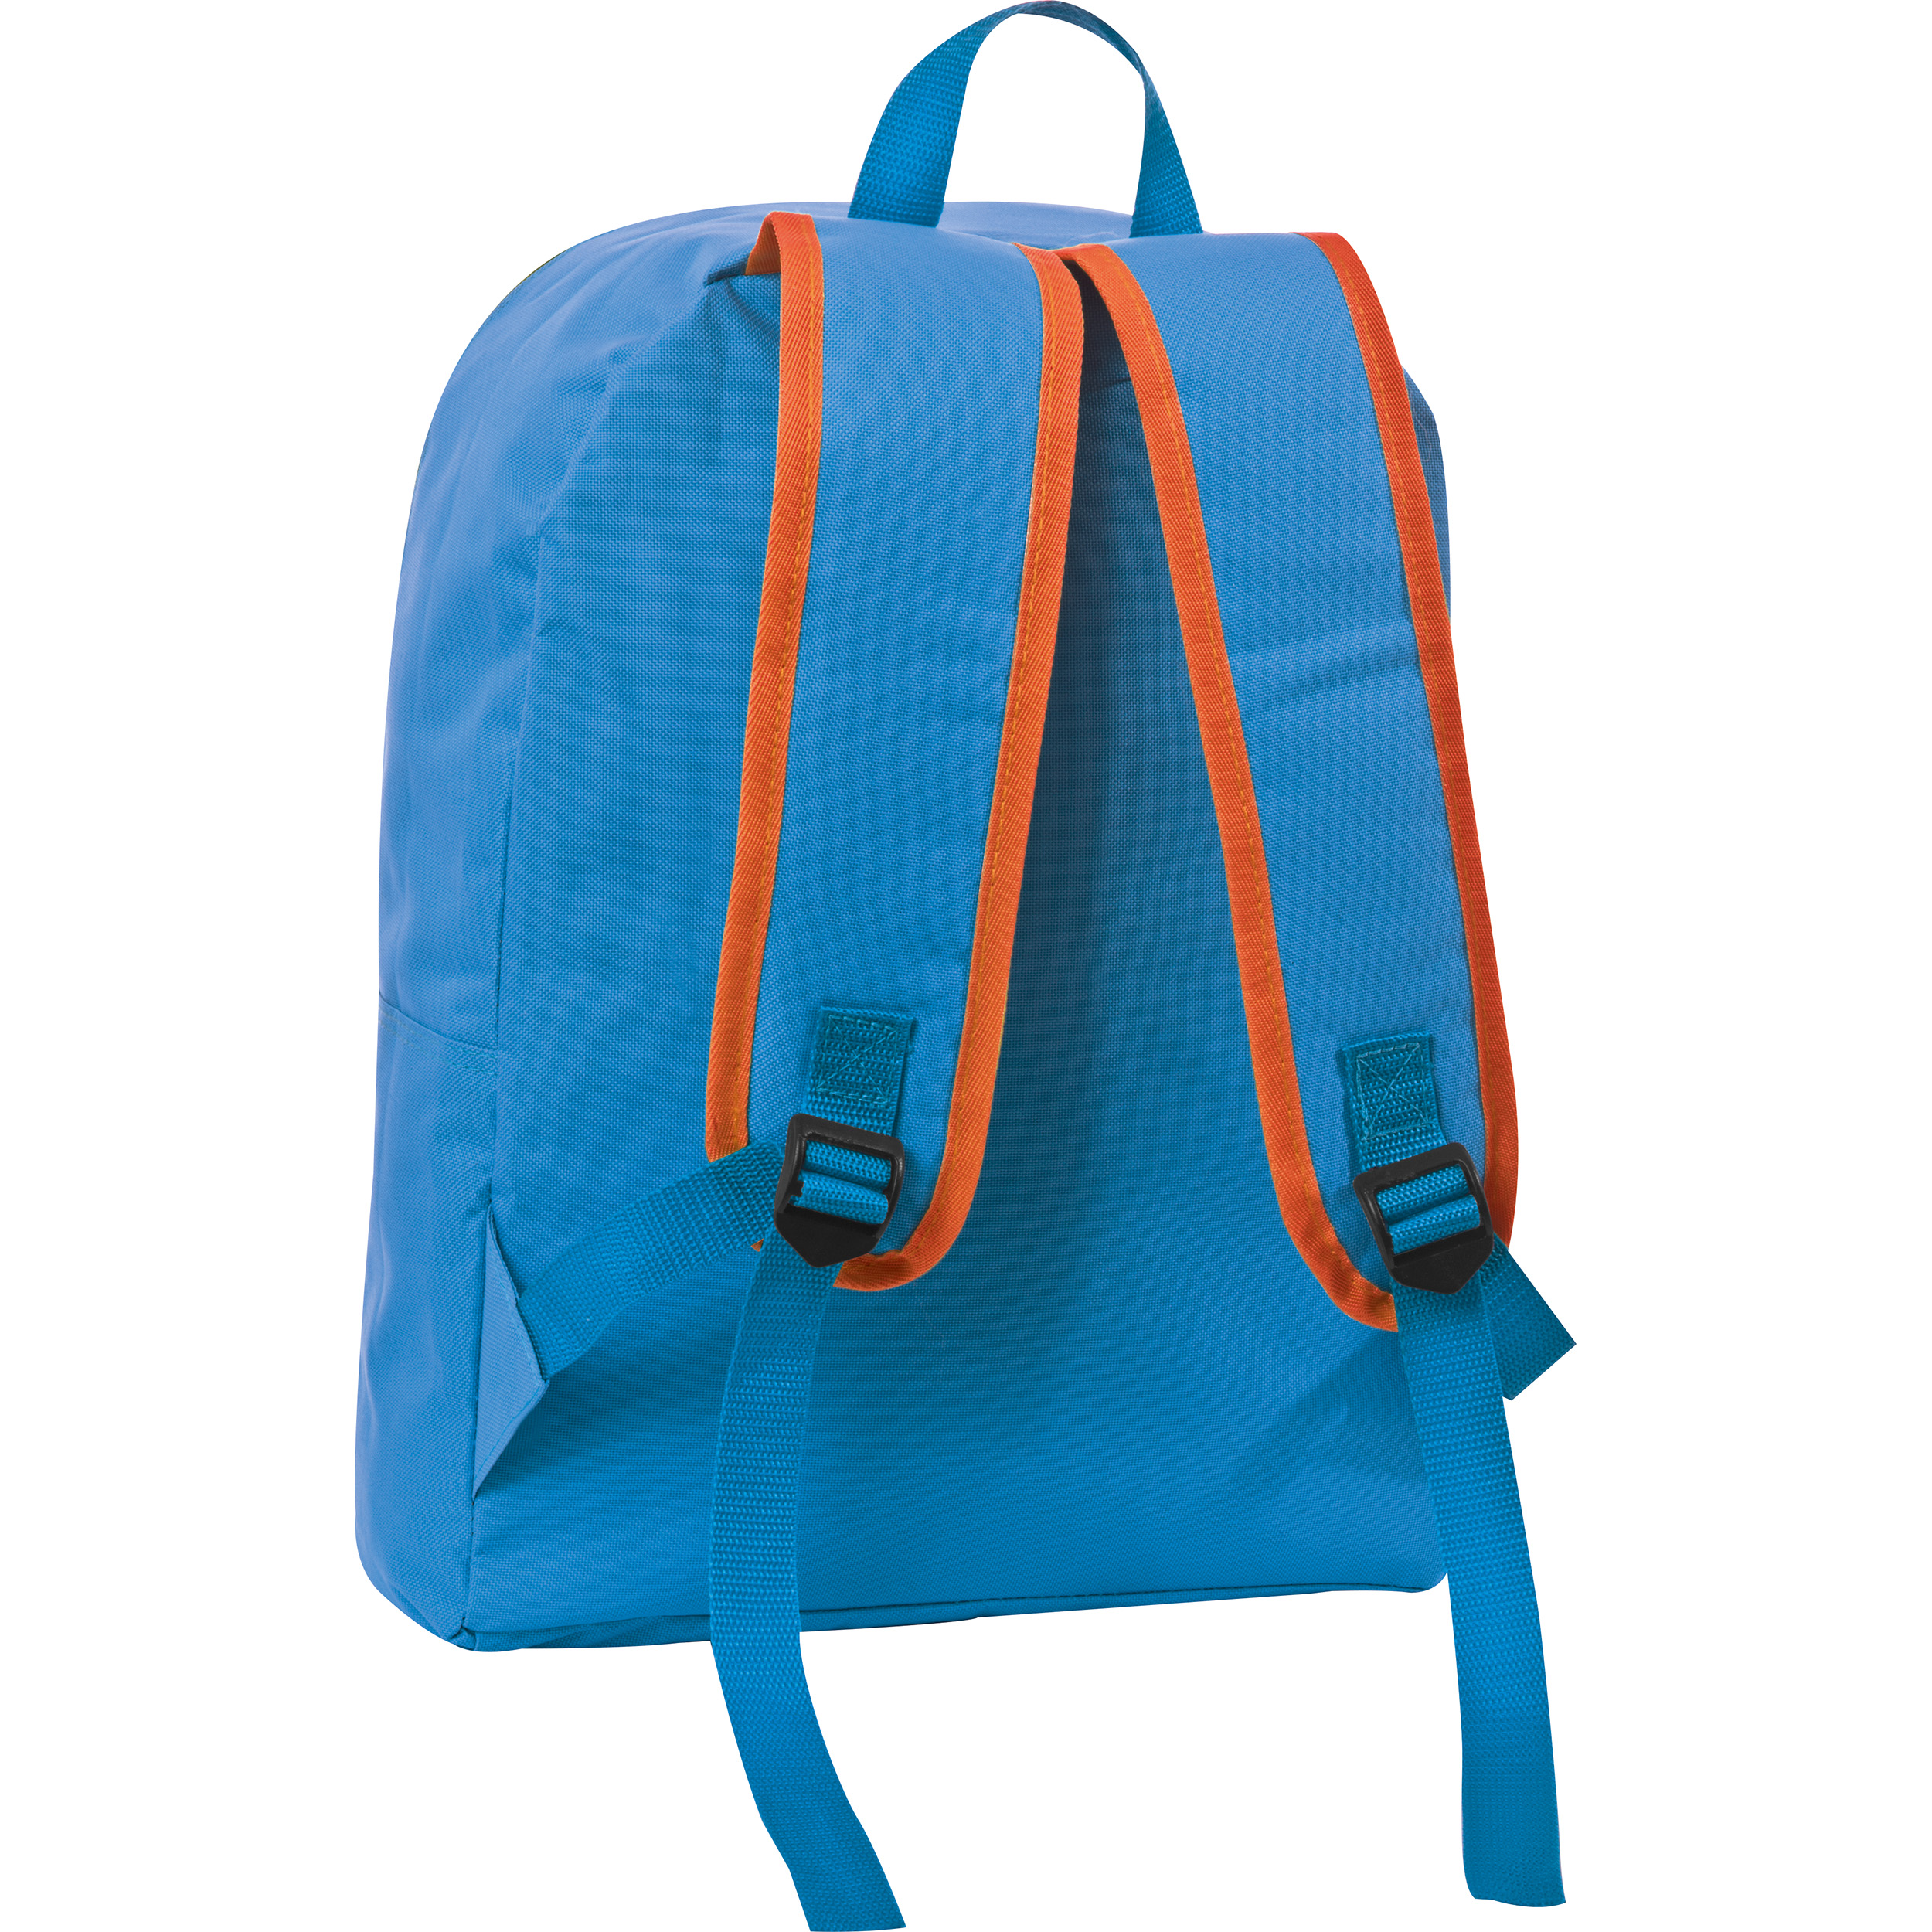 Backpack in neon